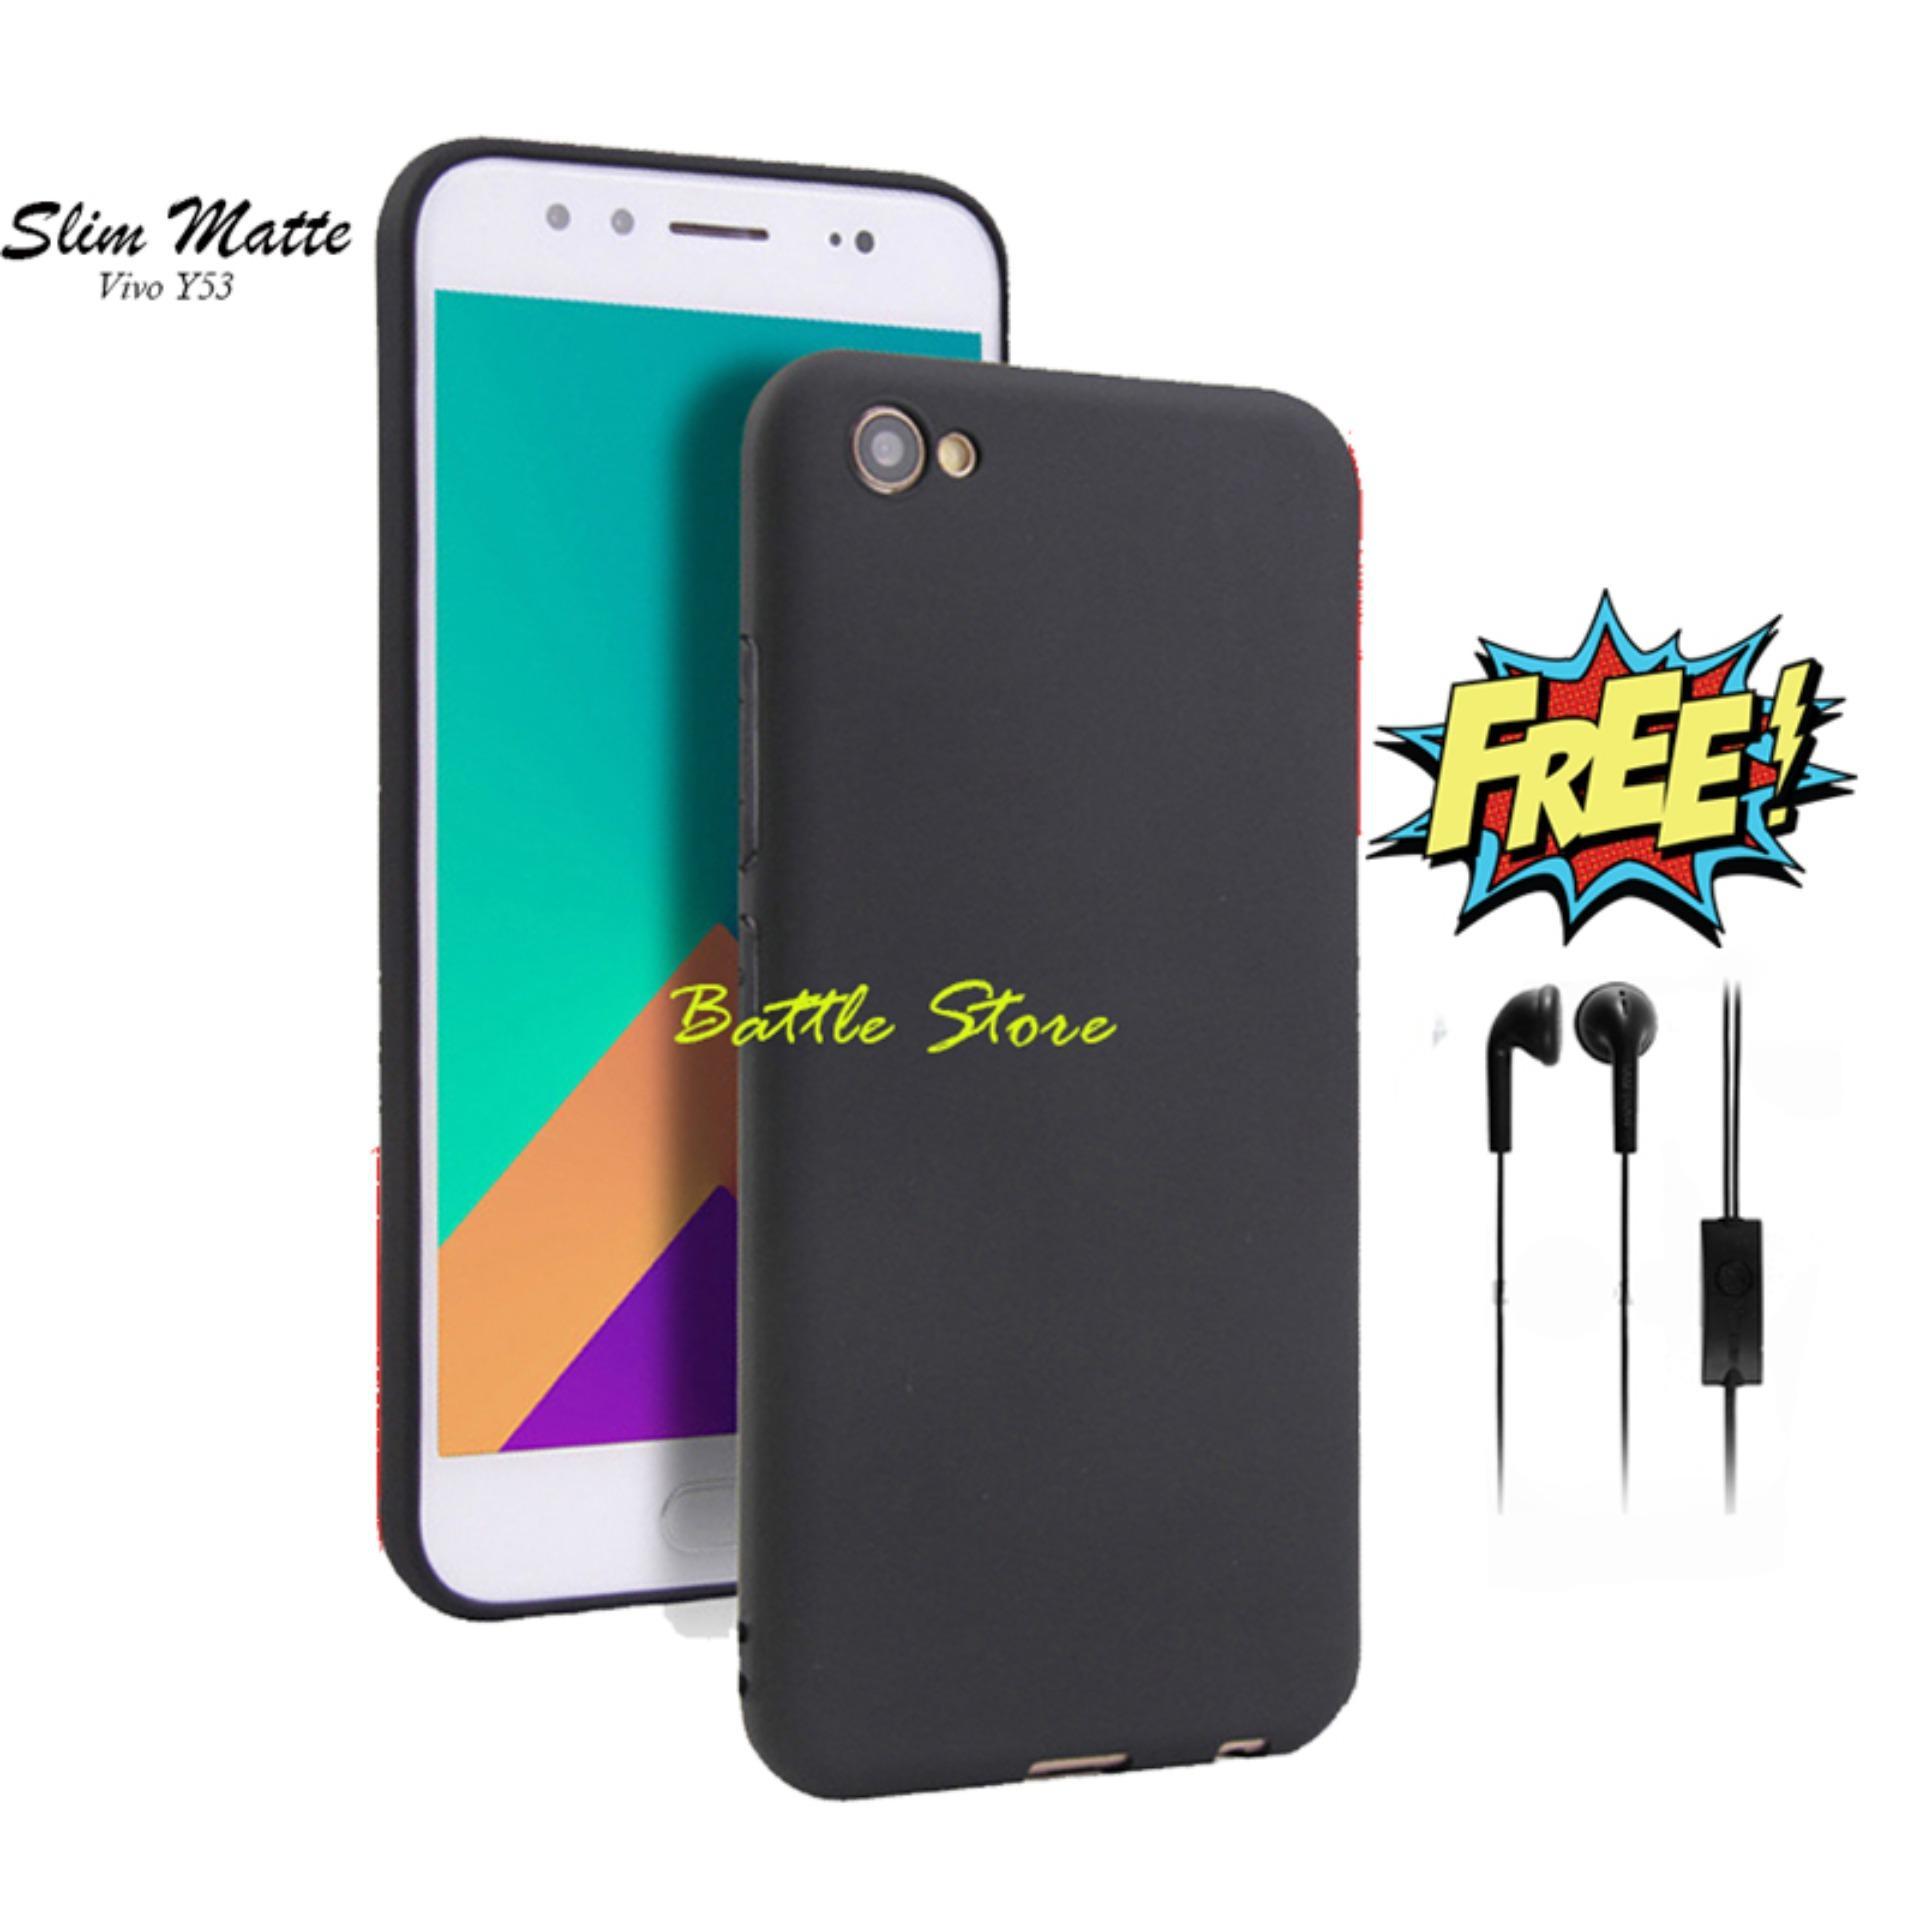 Case Slim Black Matte Vivo Y53 Baby Skin Softcase Ultra Thin Jelly Silikon Babyskin + Free